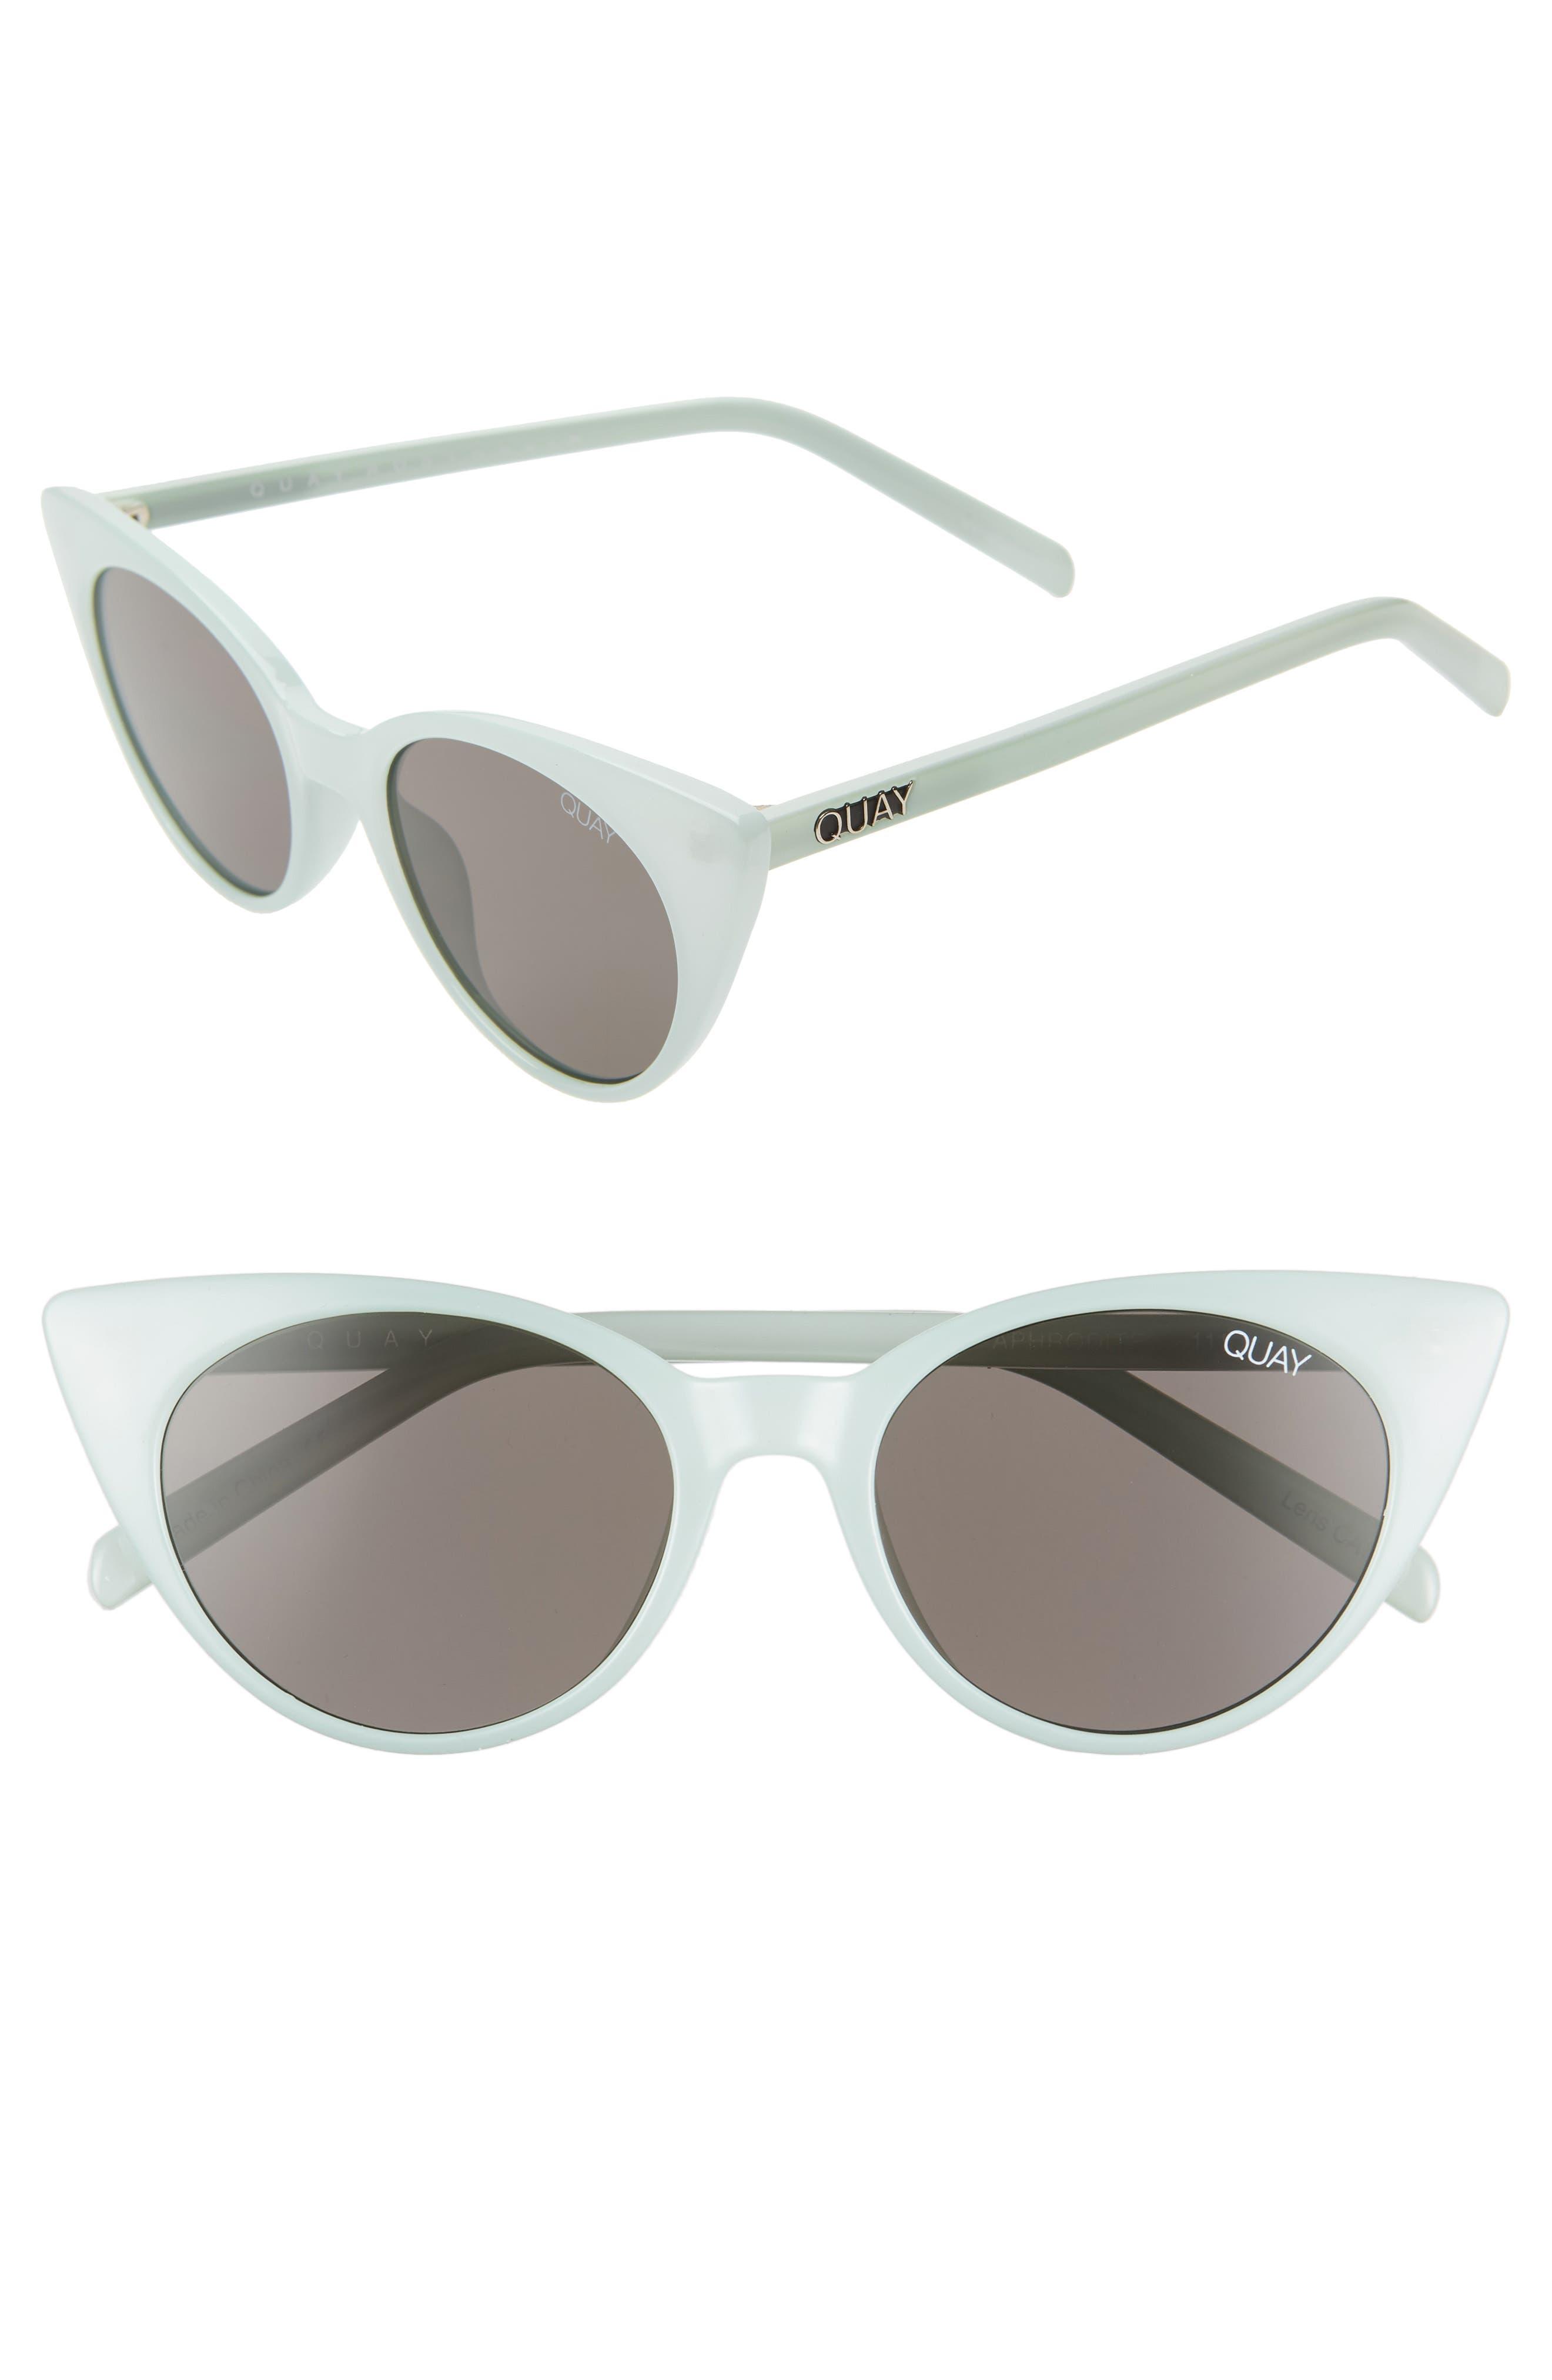 30be11575c8d8 Quay Australia Aphrodite 5m Cat Eye Sunglasses - Mint  Smoke